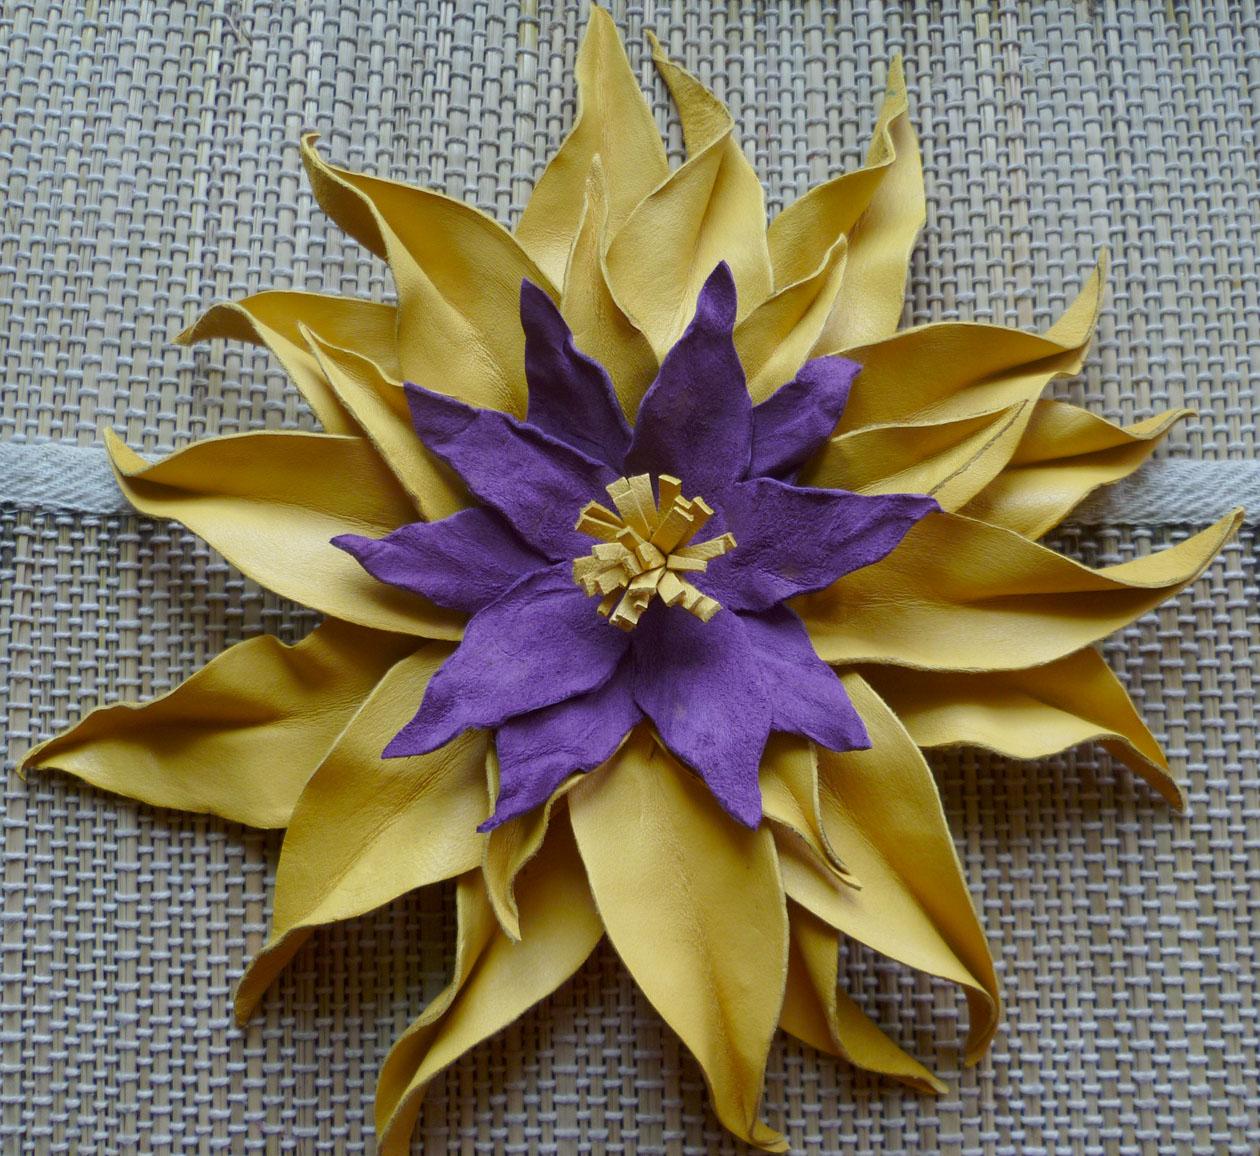 http://4.bp.blogspot.com/-BDB1n6FJ8IA/TYmiFO9QsdI/AAAAAAAAC44/Ecx79DFESeQ/s1600/my+leather+flowers+%252821%2529.jpg